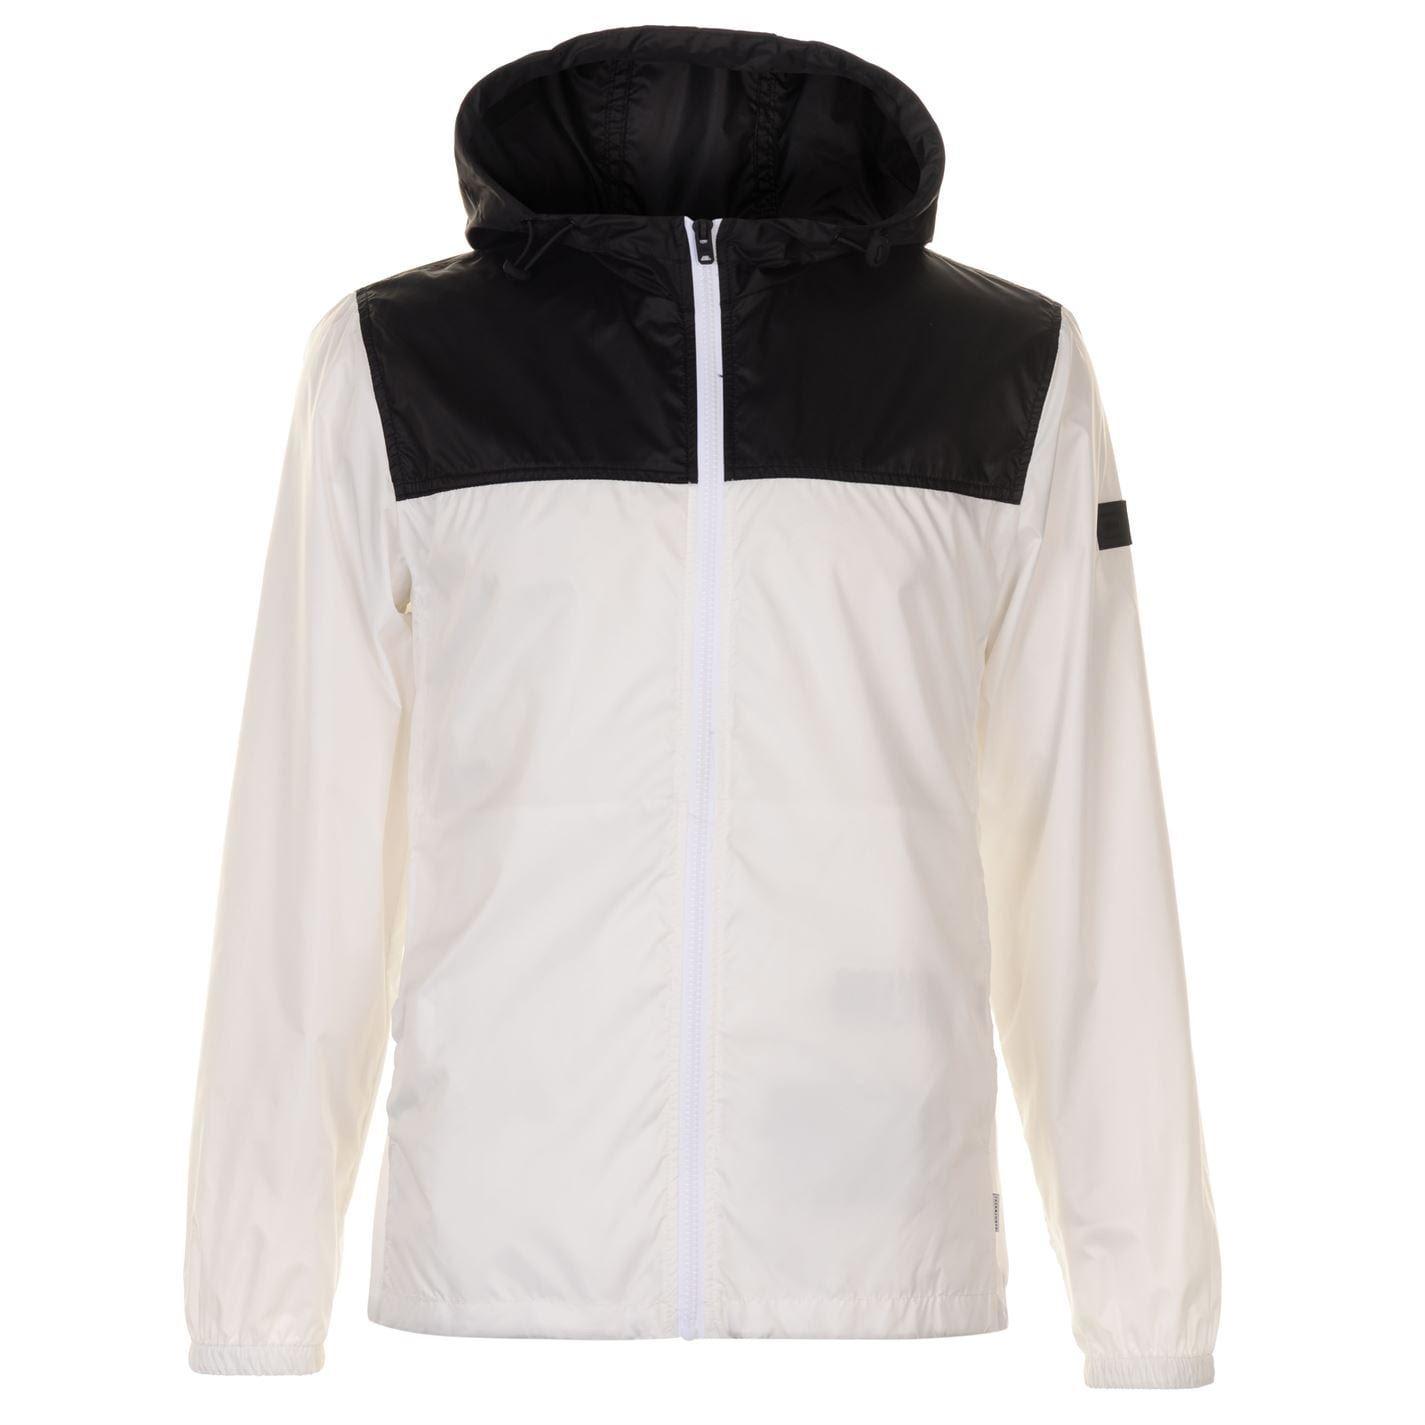 Jack /& Jones Core Jacket Lightweight Casual Windbreaker Coat Mens JCOPete